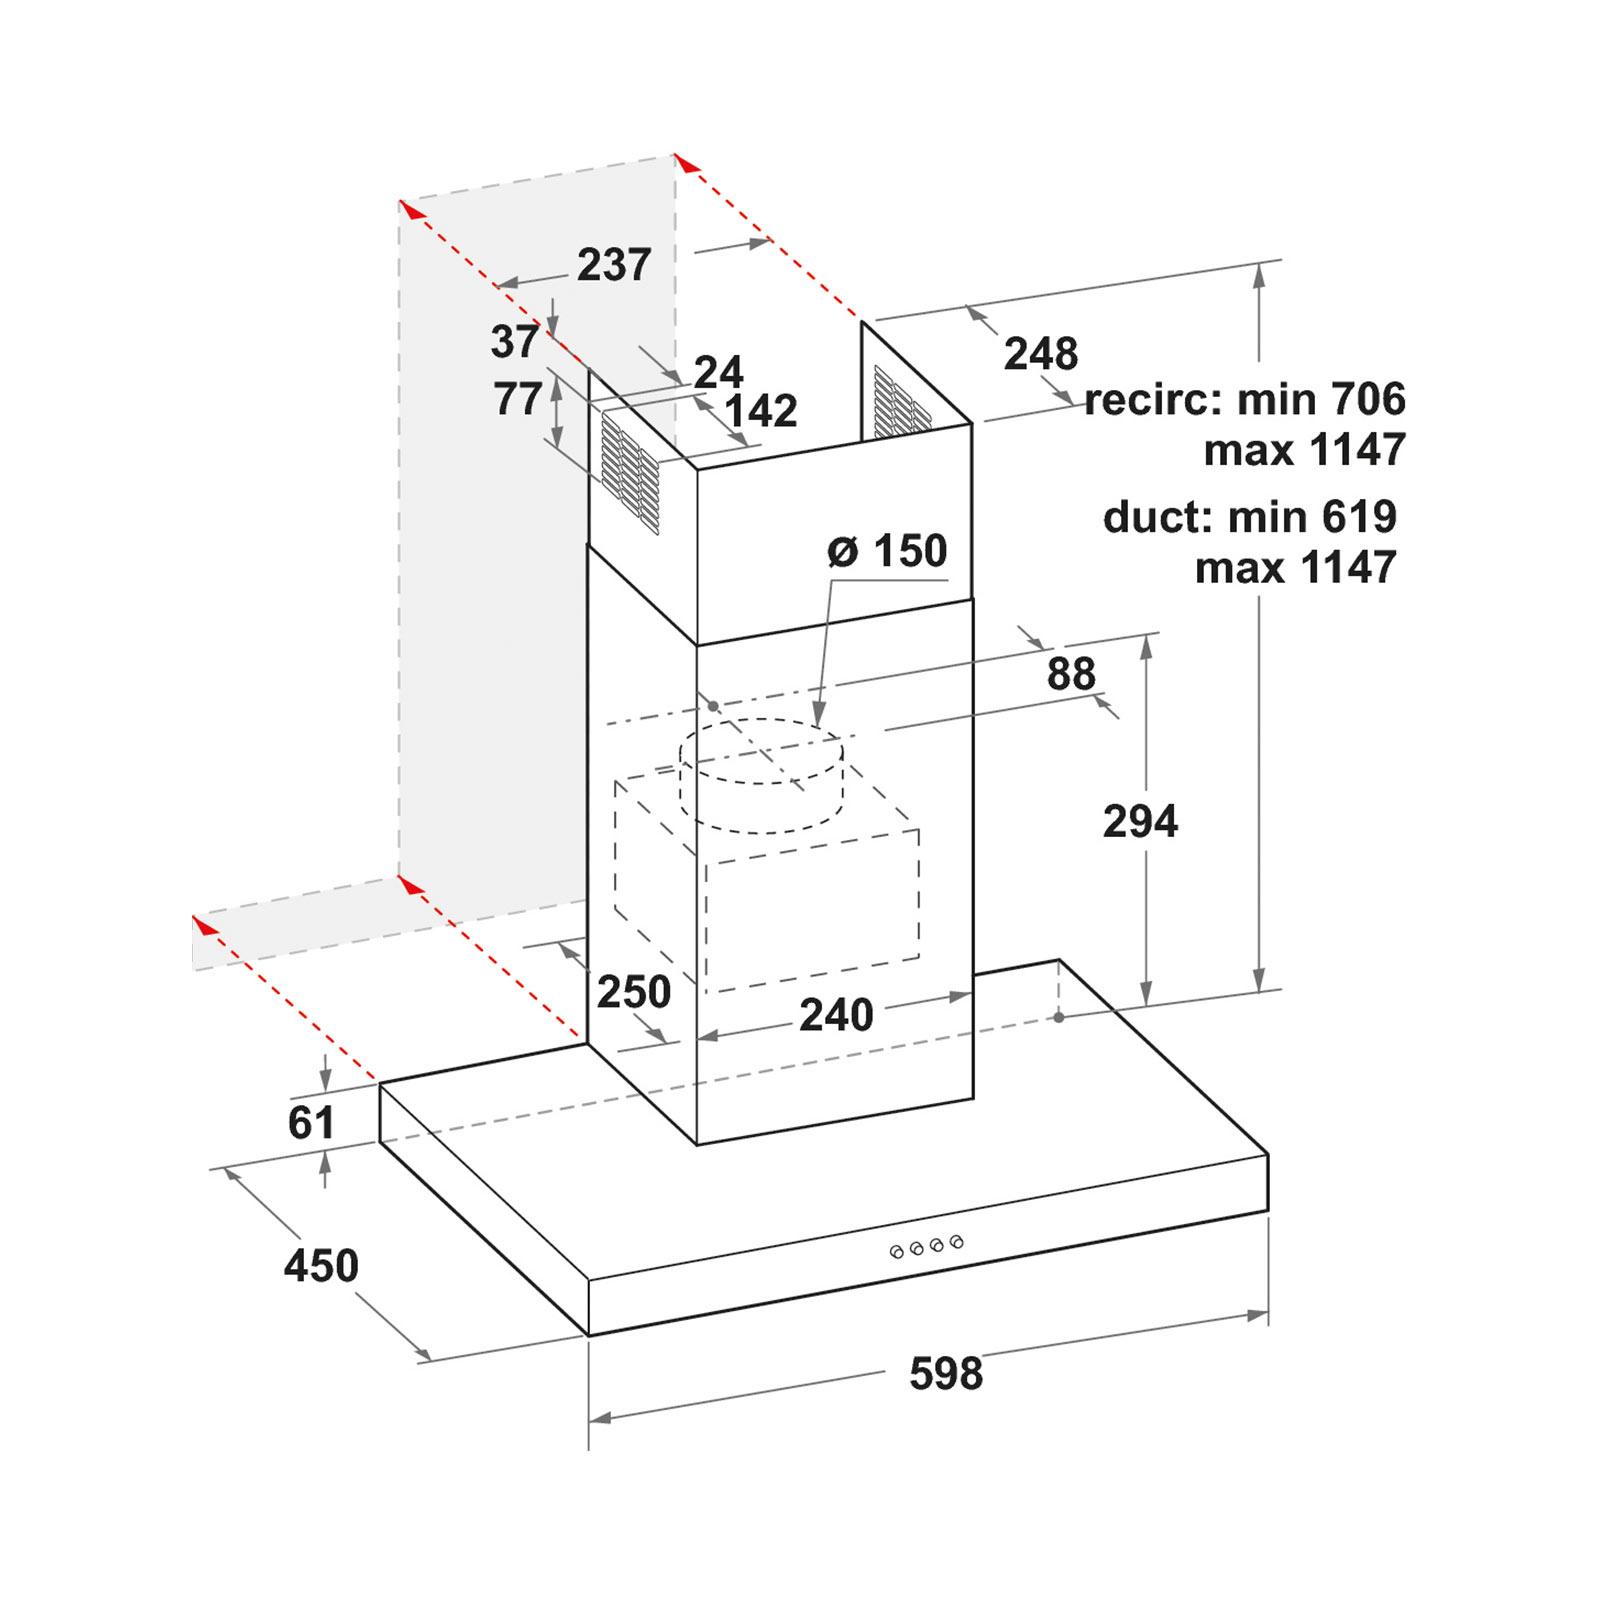 Dunstabzugshaube Edelstahl 60 Cm 2021